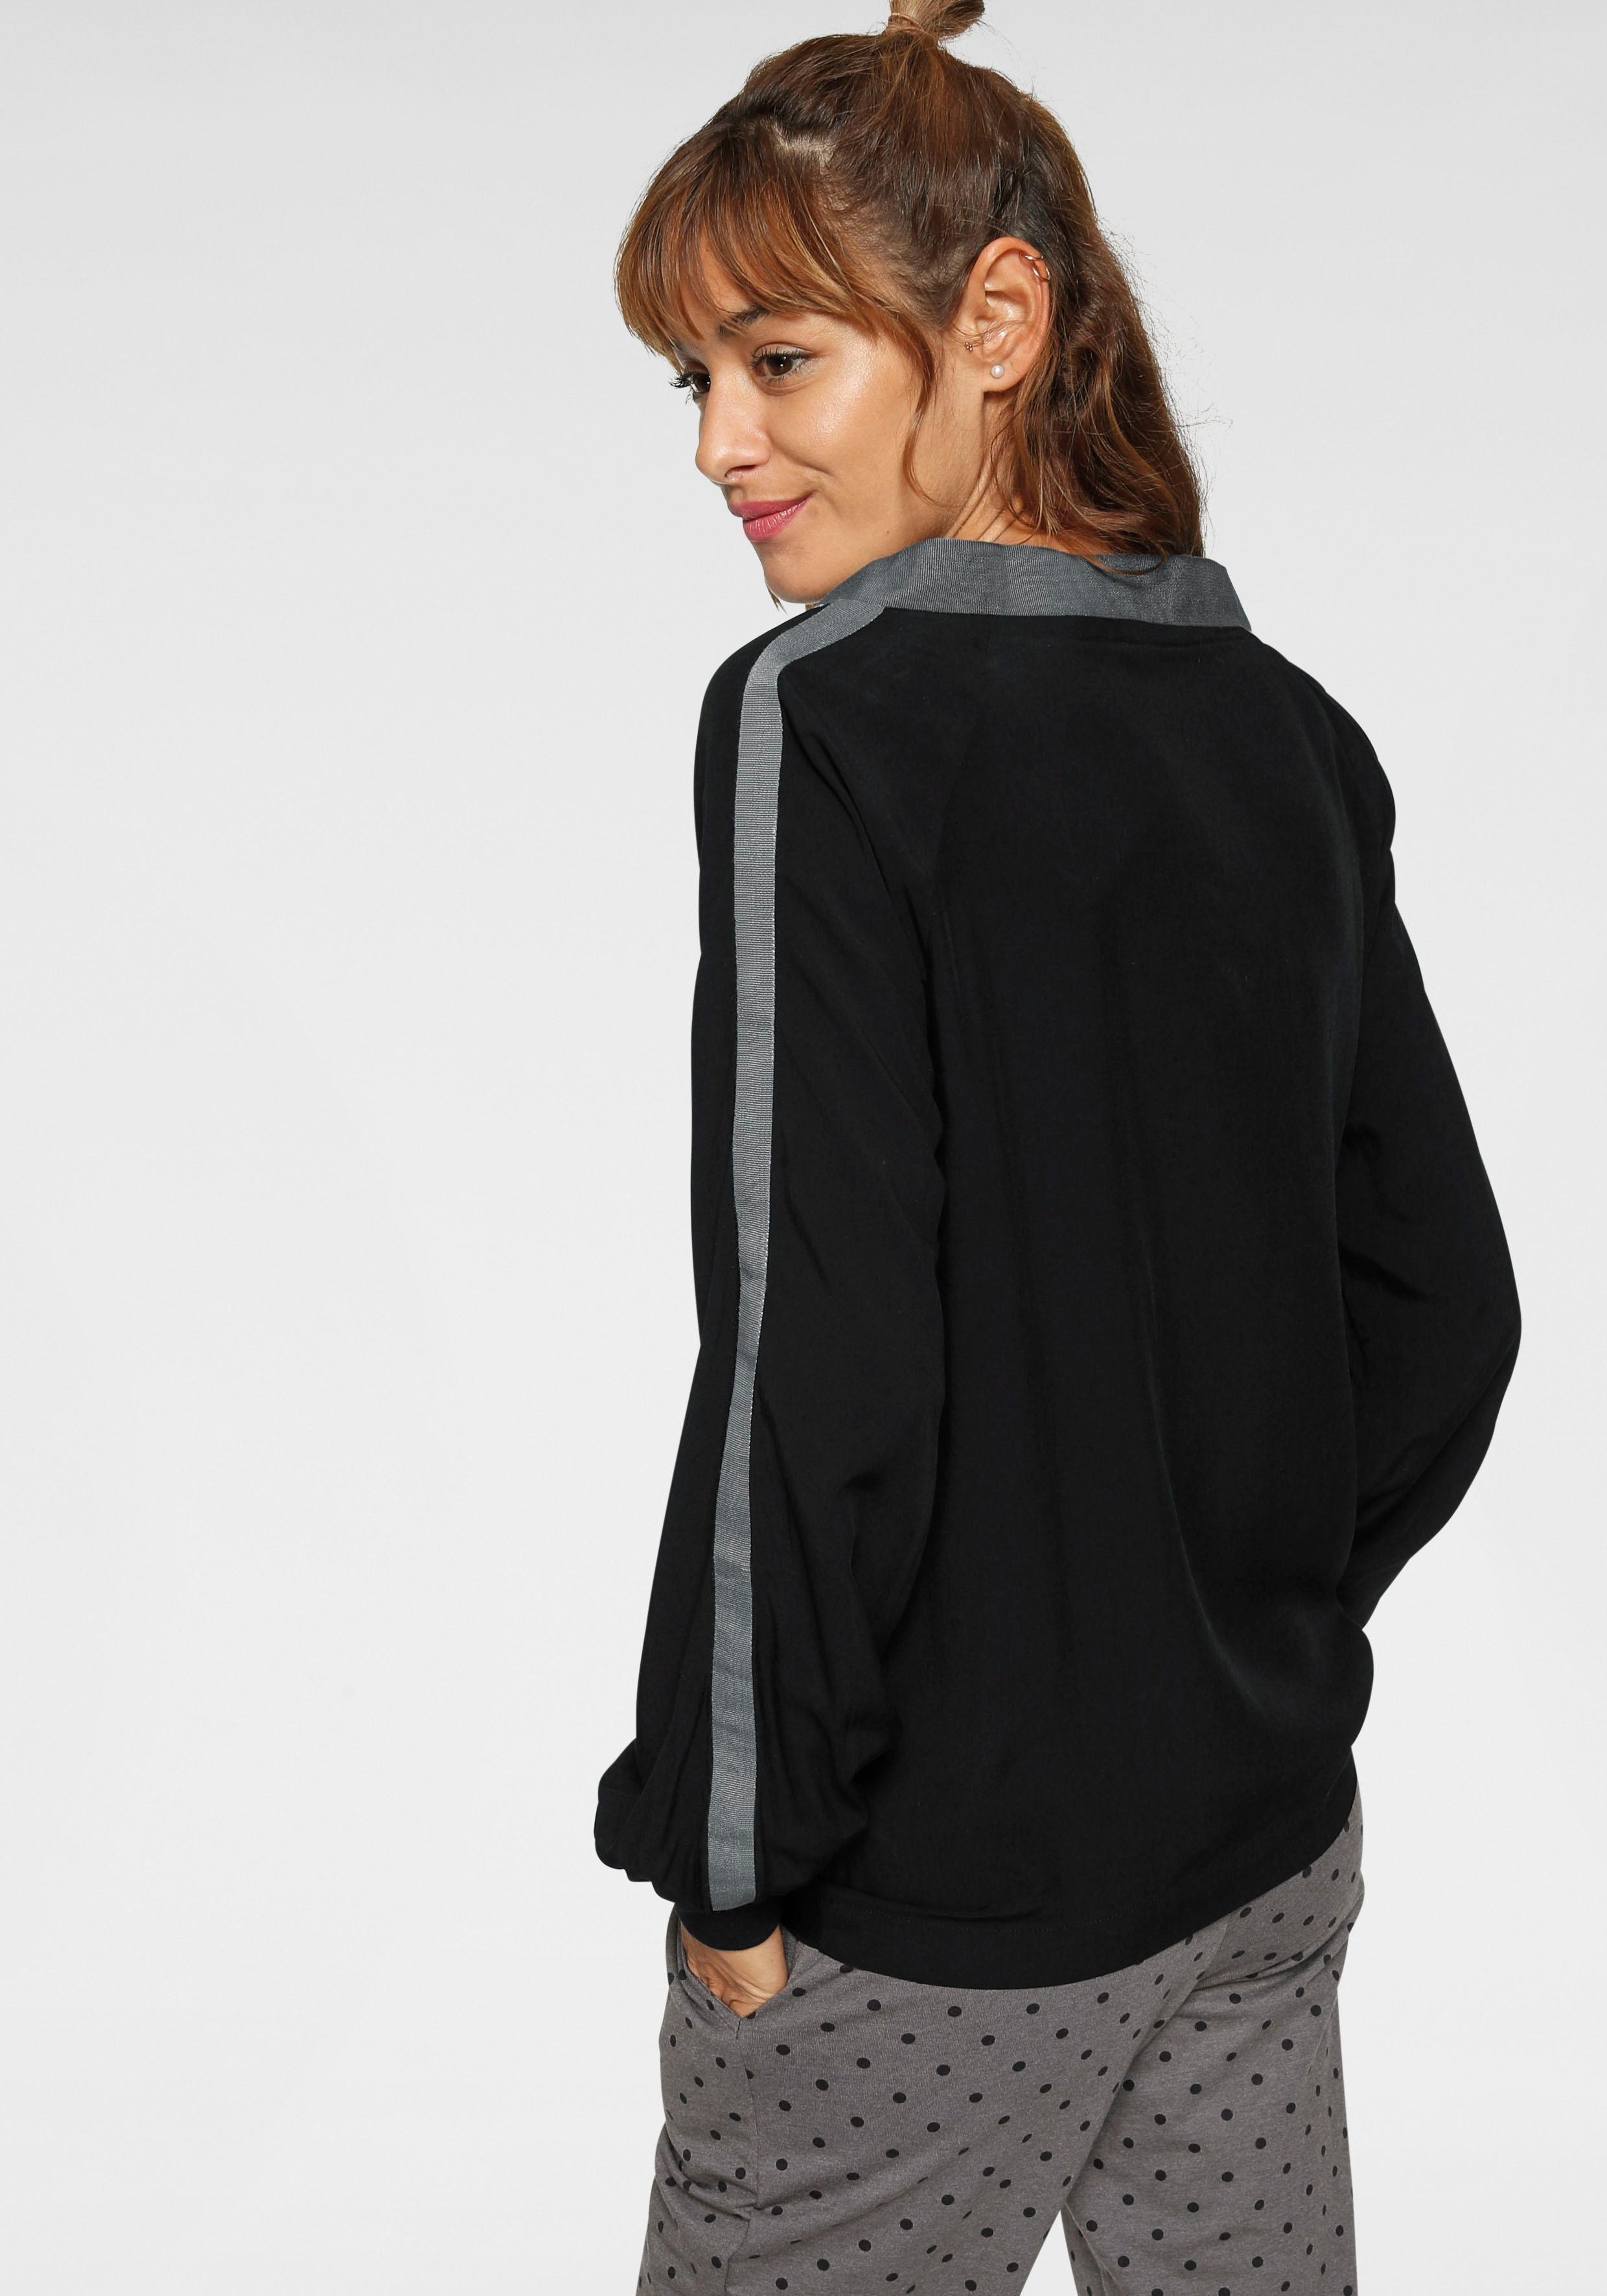 AJC blouse zonder sluiting online kopen op otto.nl